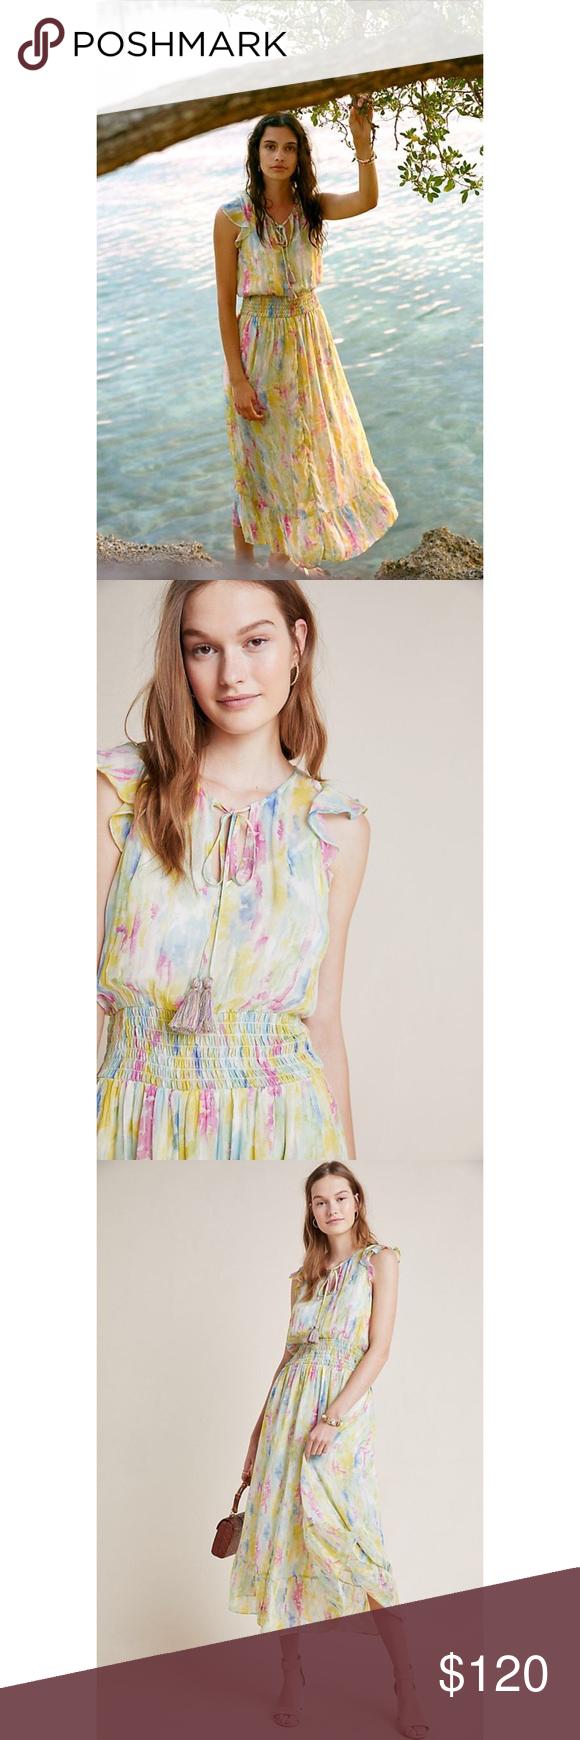 Anthropologie Watercolor Maxi Dress Maxi Dress Designs Occasion Dresses Anthropologie Dress [ 1740 x 580 Pixel ]